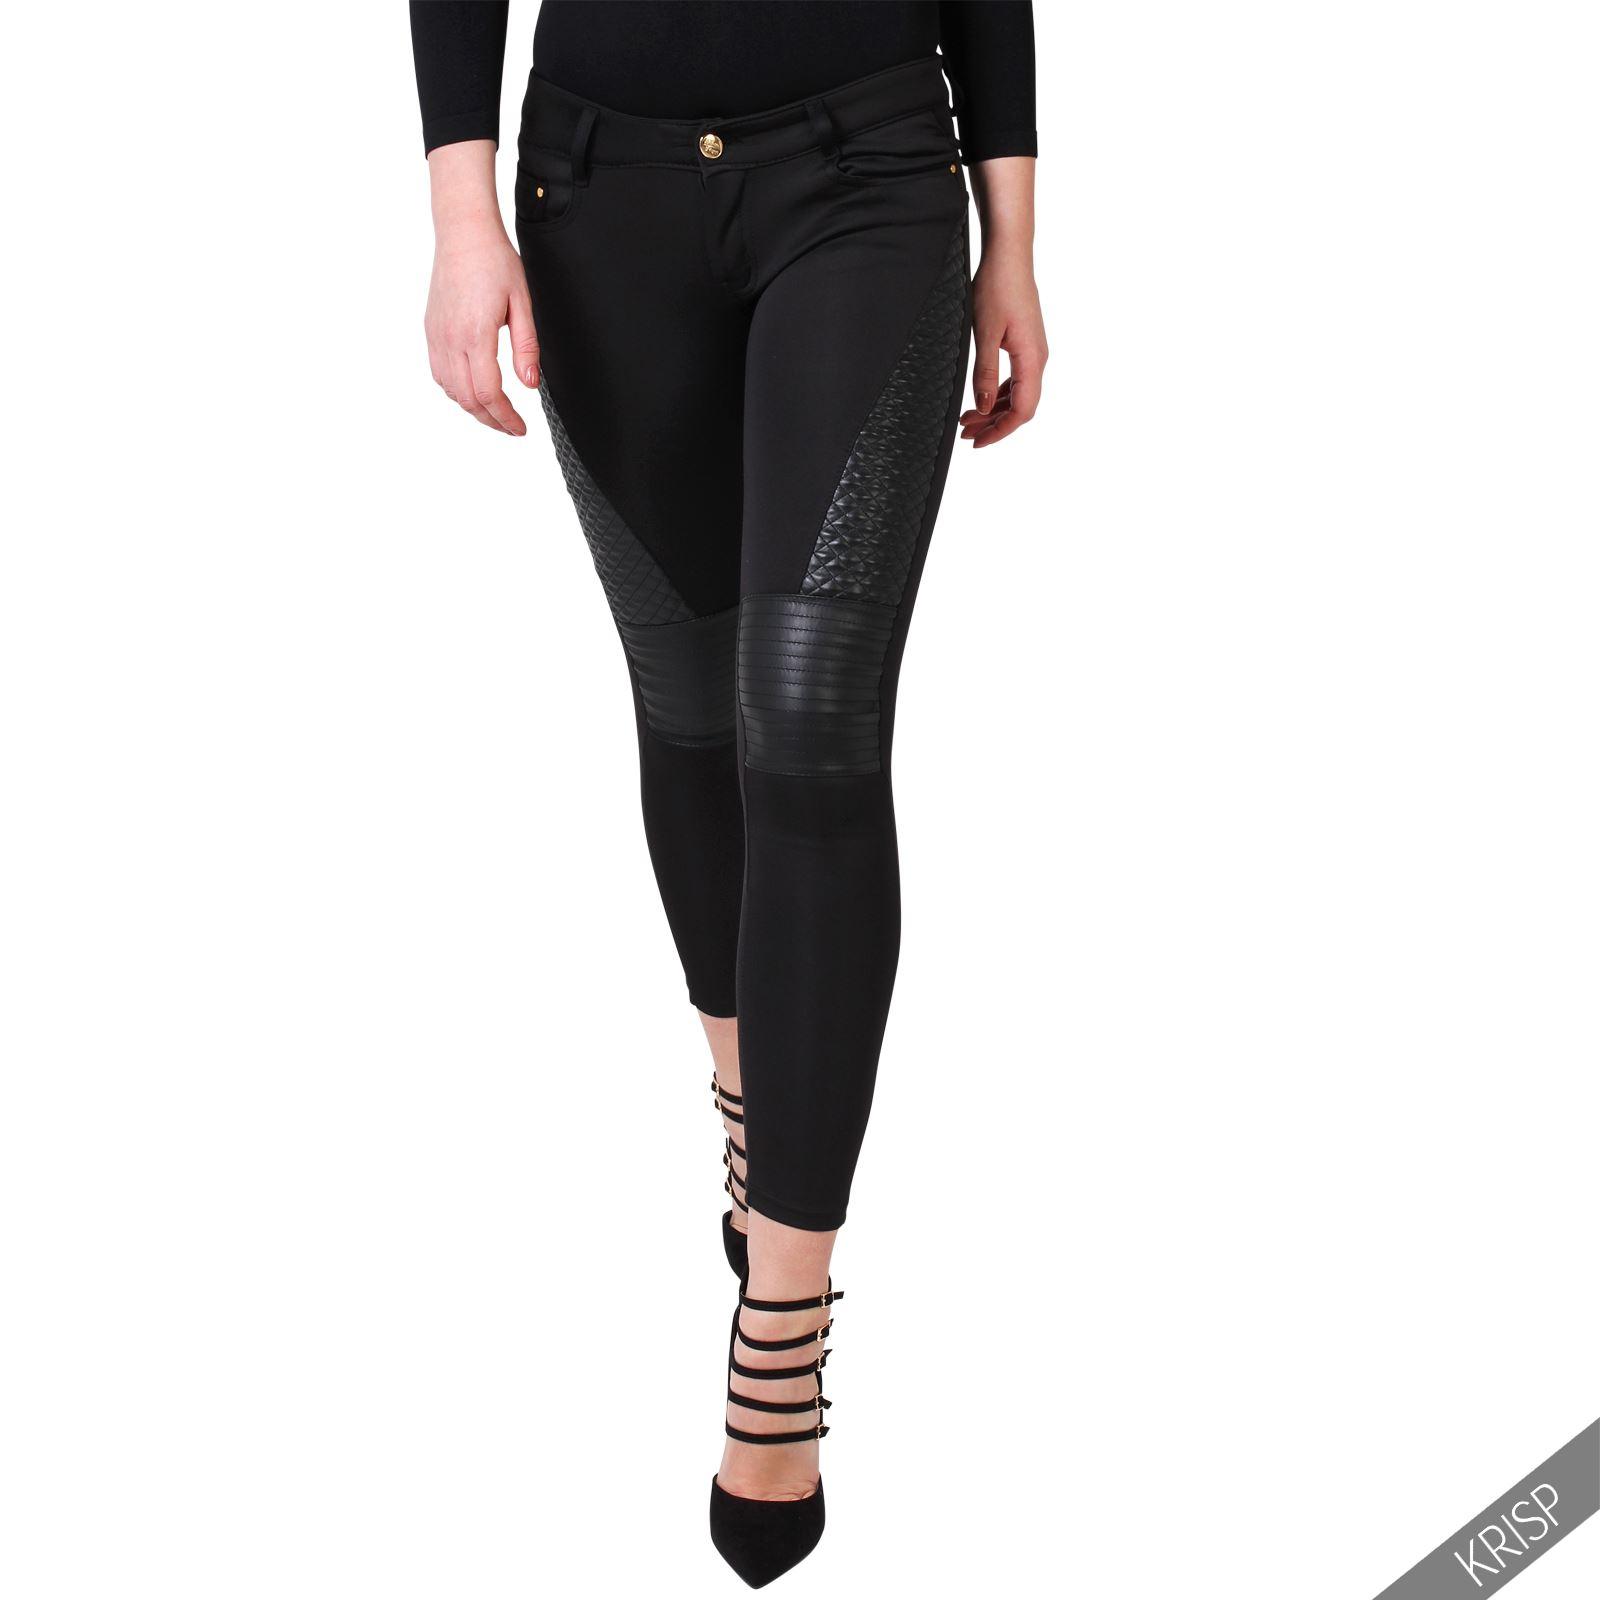 krisp pantalon motard simili cuir sexy biker slim skinny leggings jeggins ebay. Black Bedroom Furniture Sets. Home Design Ideas